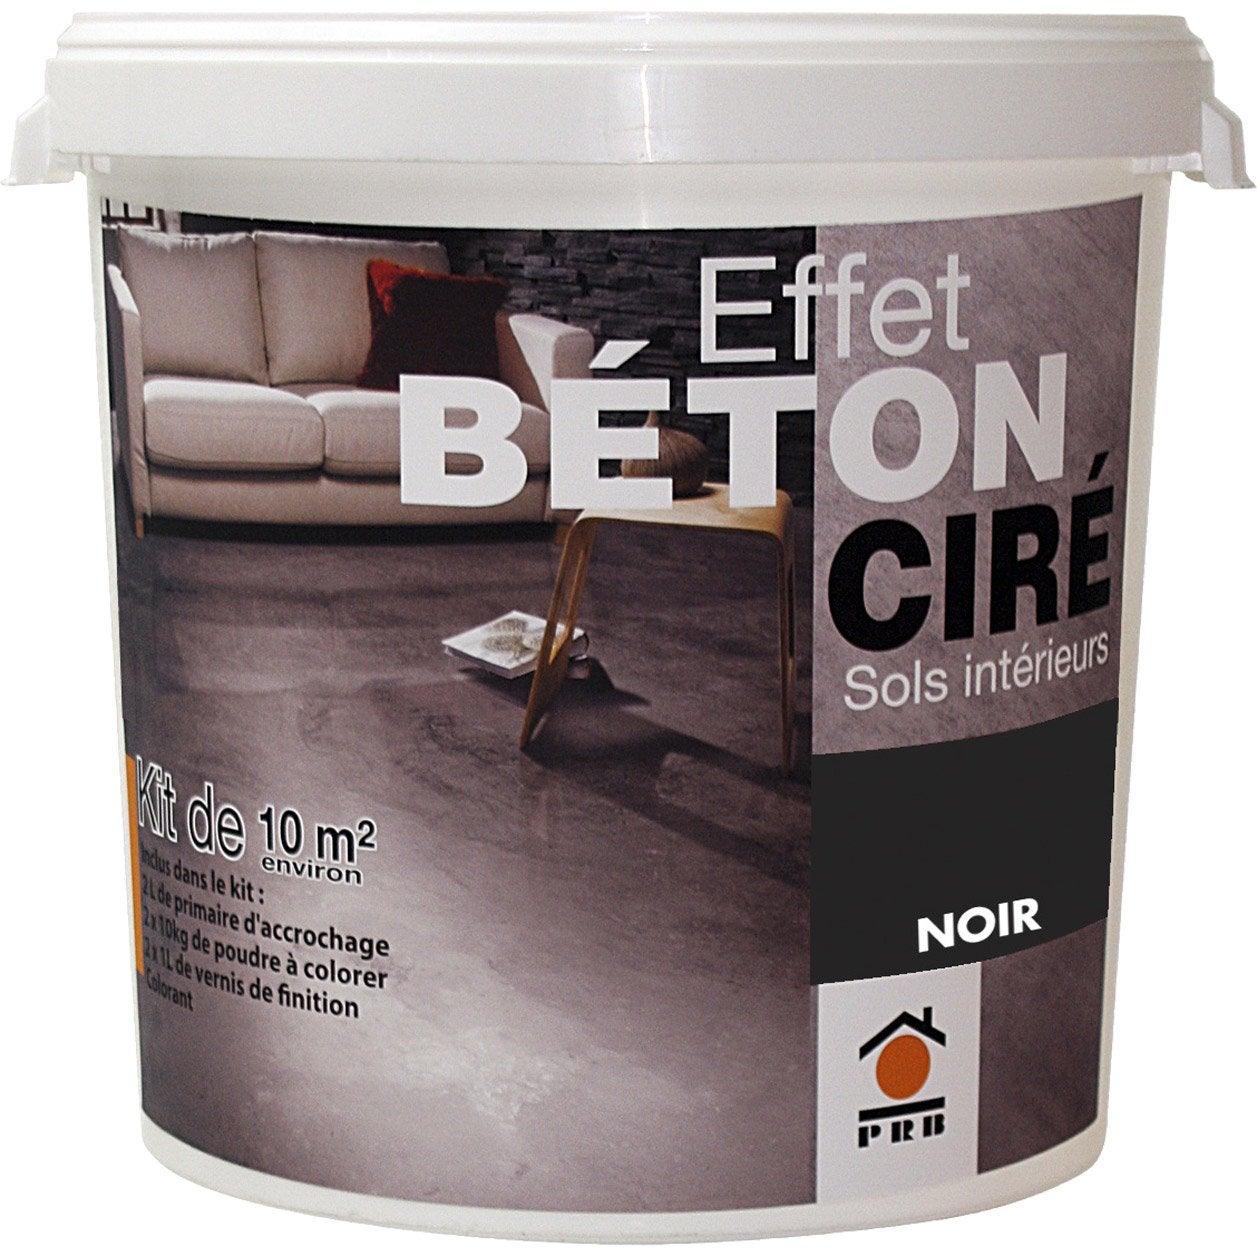 b ton effet cir gris smoke prb 10m leroy merlin. Black Bedroom Furniture Sets. Home Design Ideas